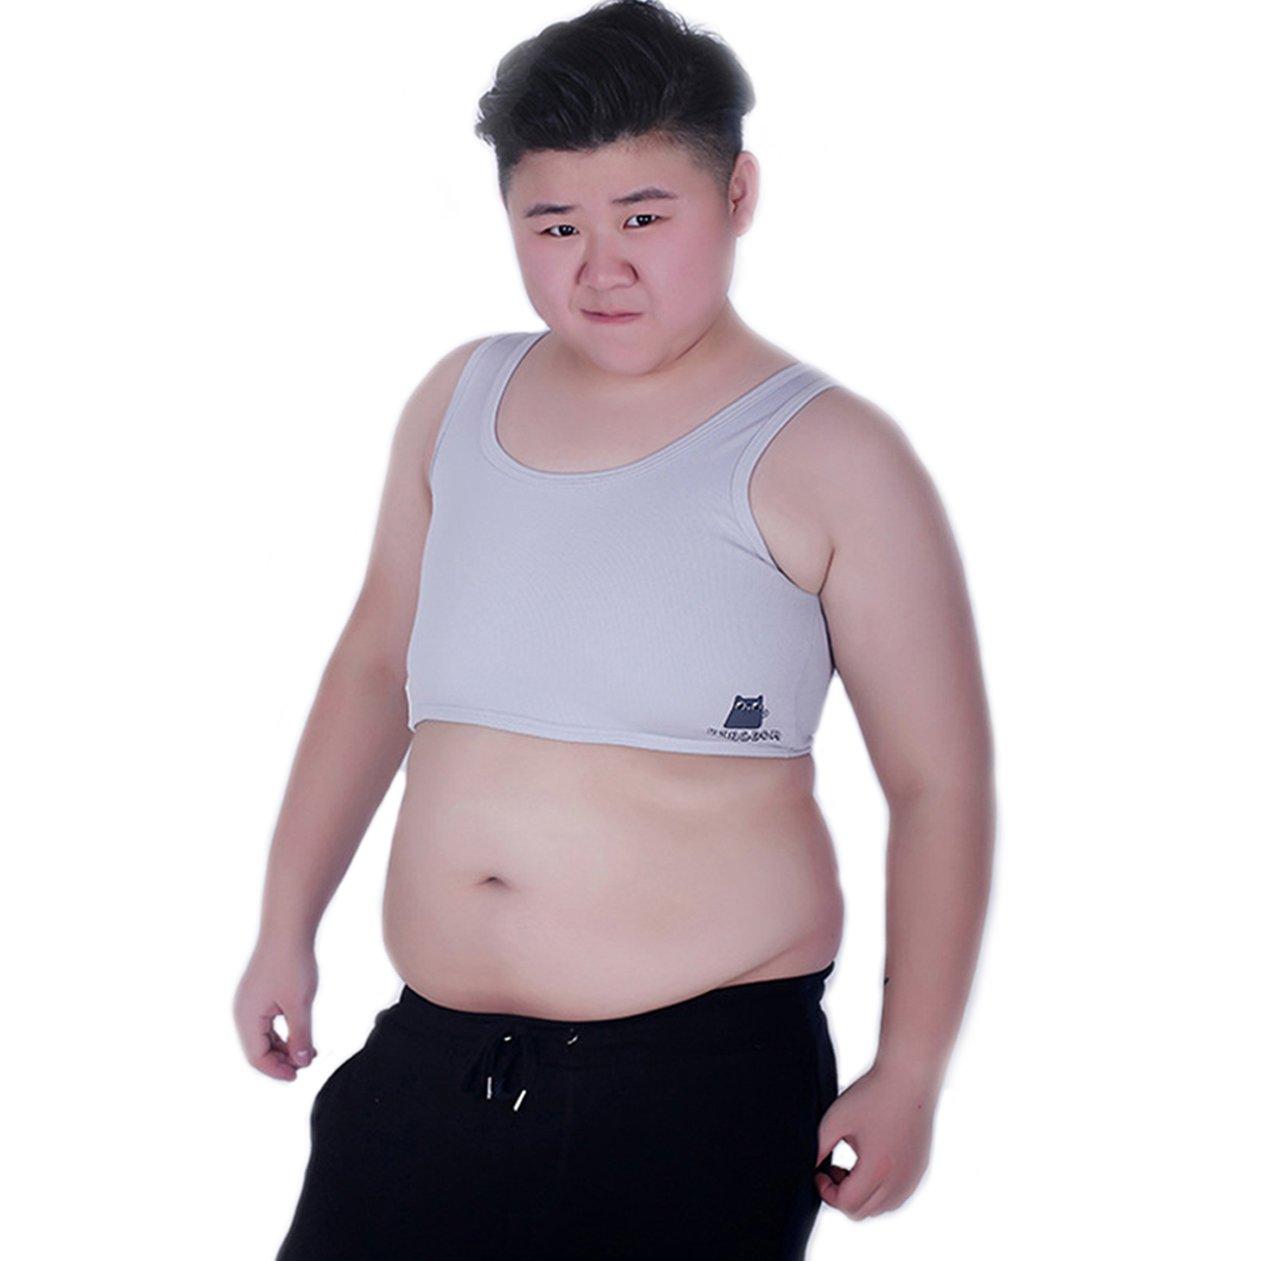 BaronHong Tomboy Trans Lesbian Mesh Chest Binder Plus Size Long Tank Top